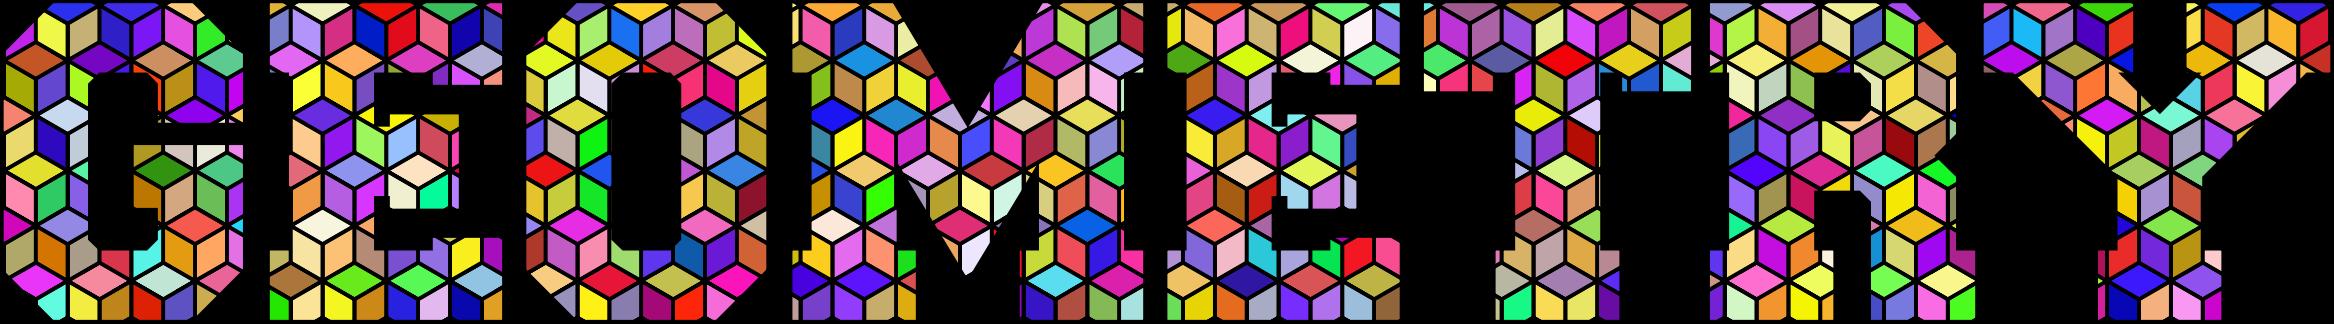 Clipart math geometry. Desktop backgrounds typography